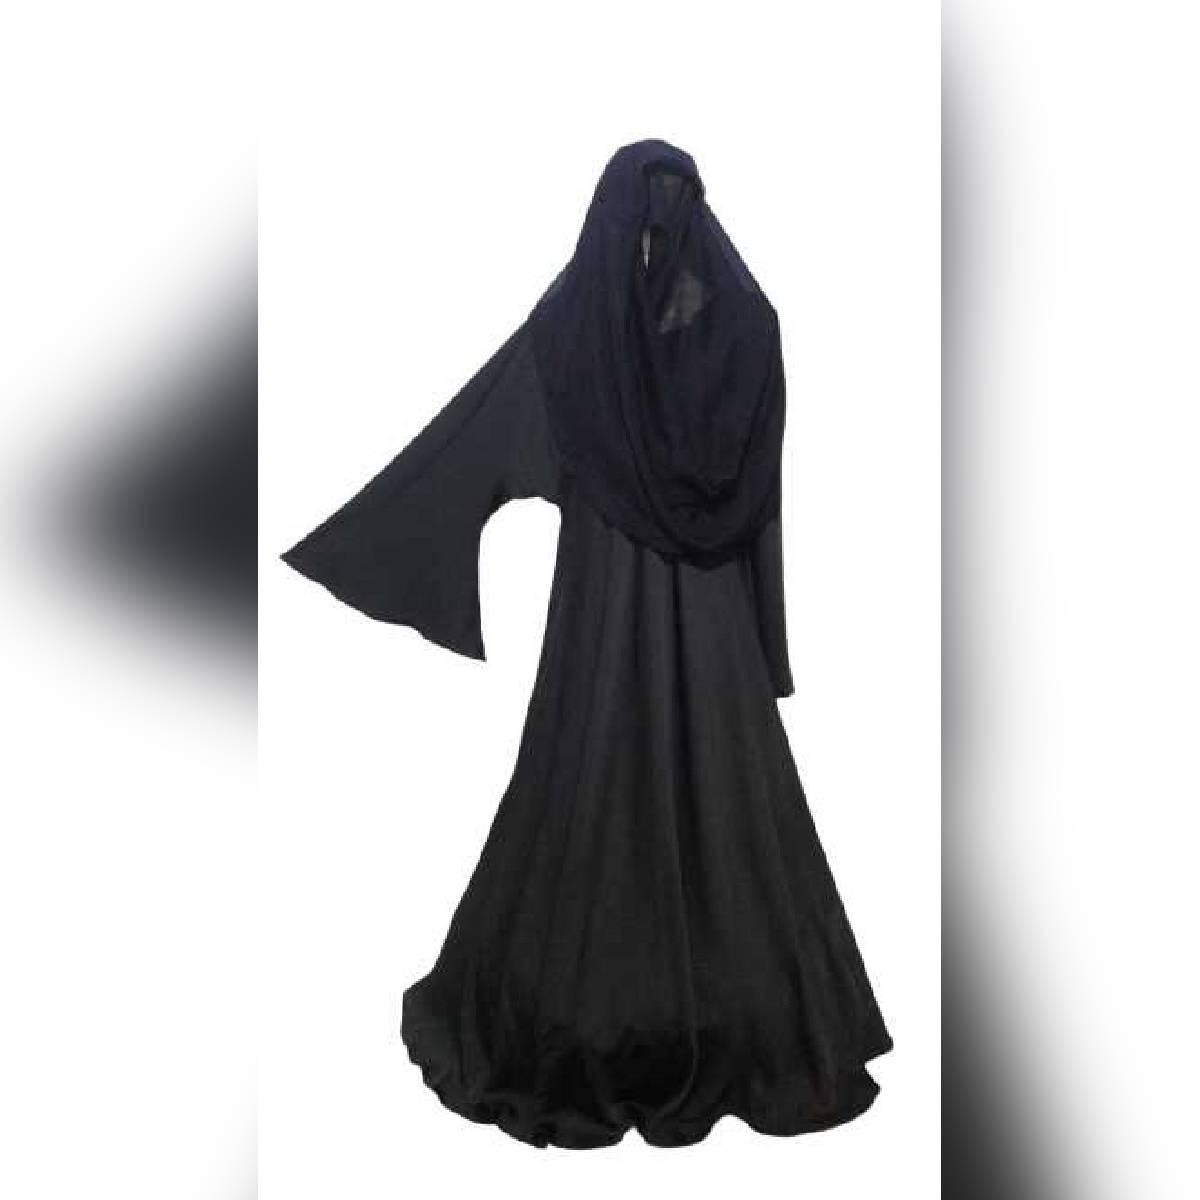 COD New Fashion Stylish Muslim Dress Abaya Dress Jubah Abaya Turkey Dress Muslim Wear for Girl Muslim Islamic Clothing for Women